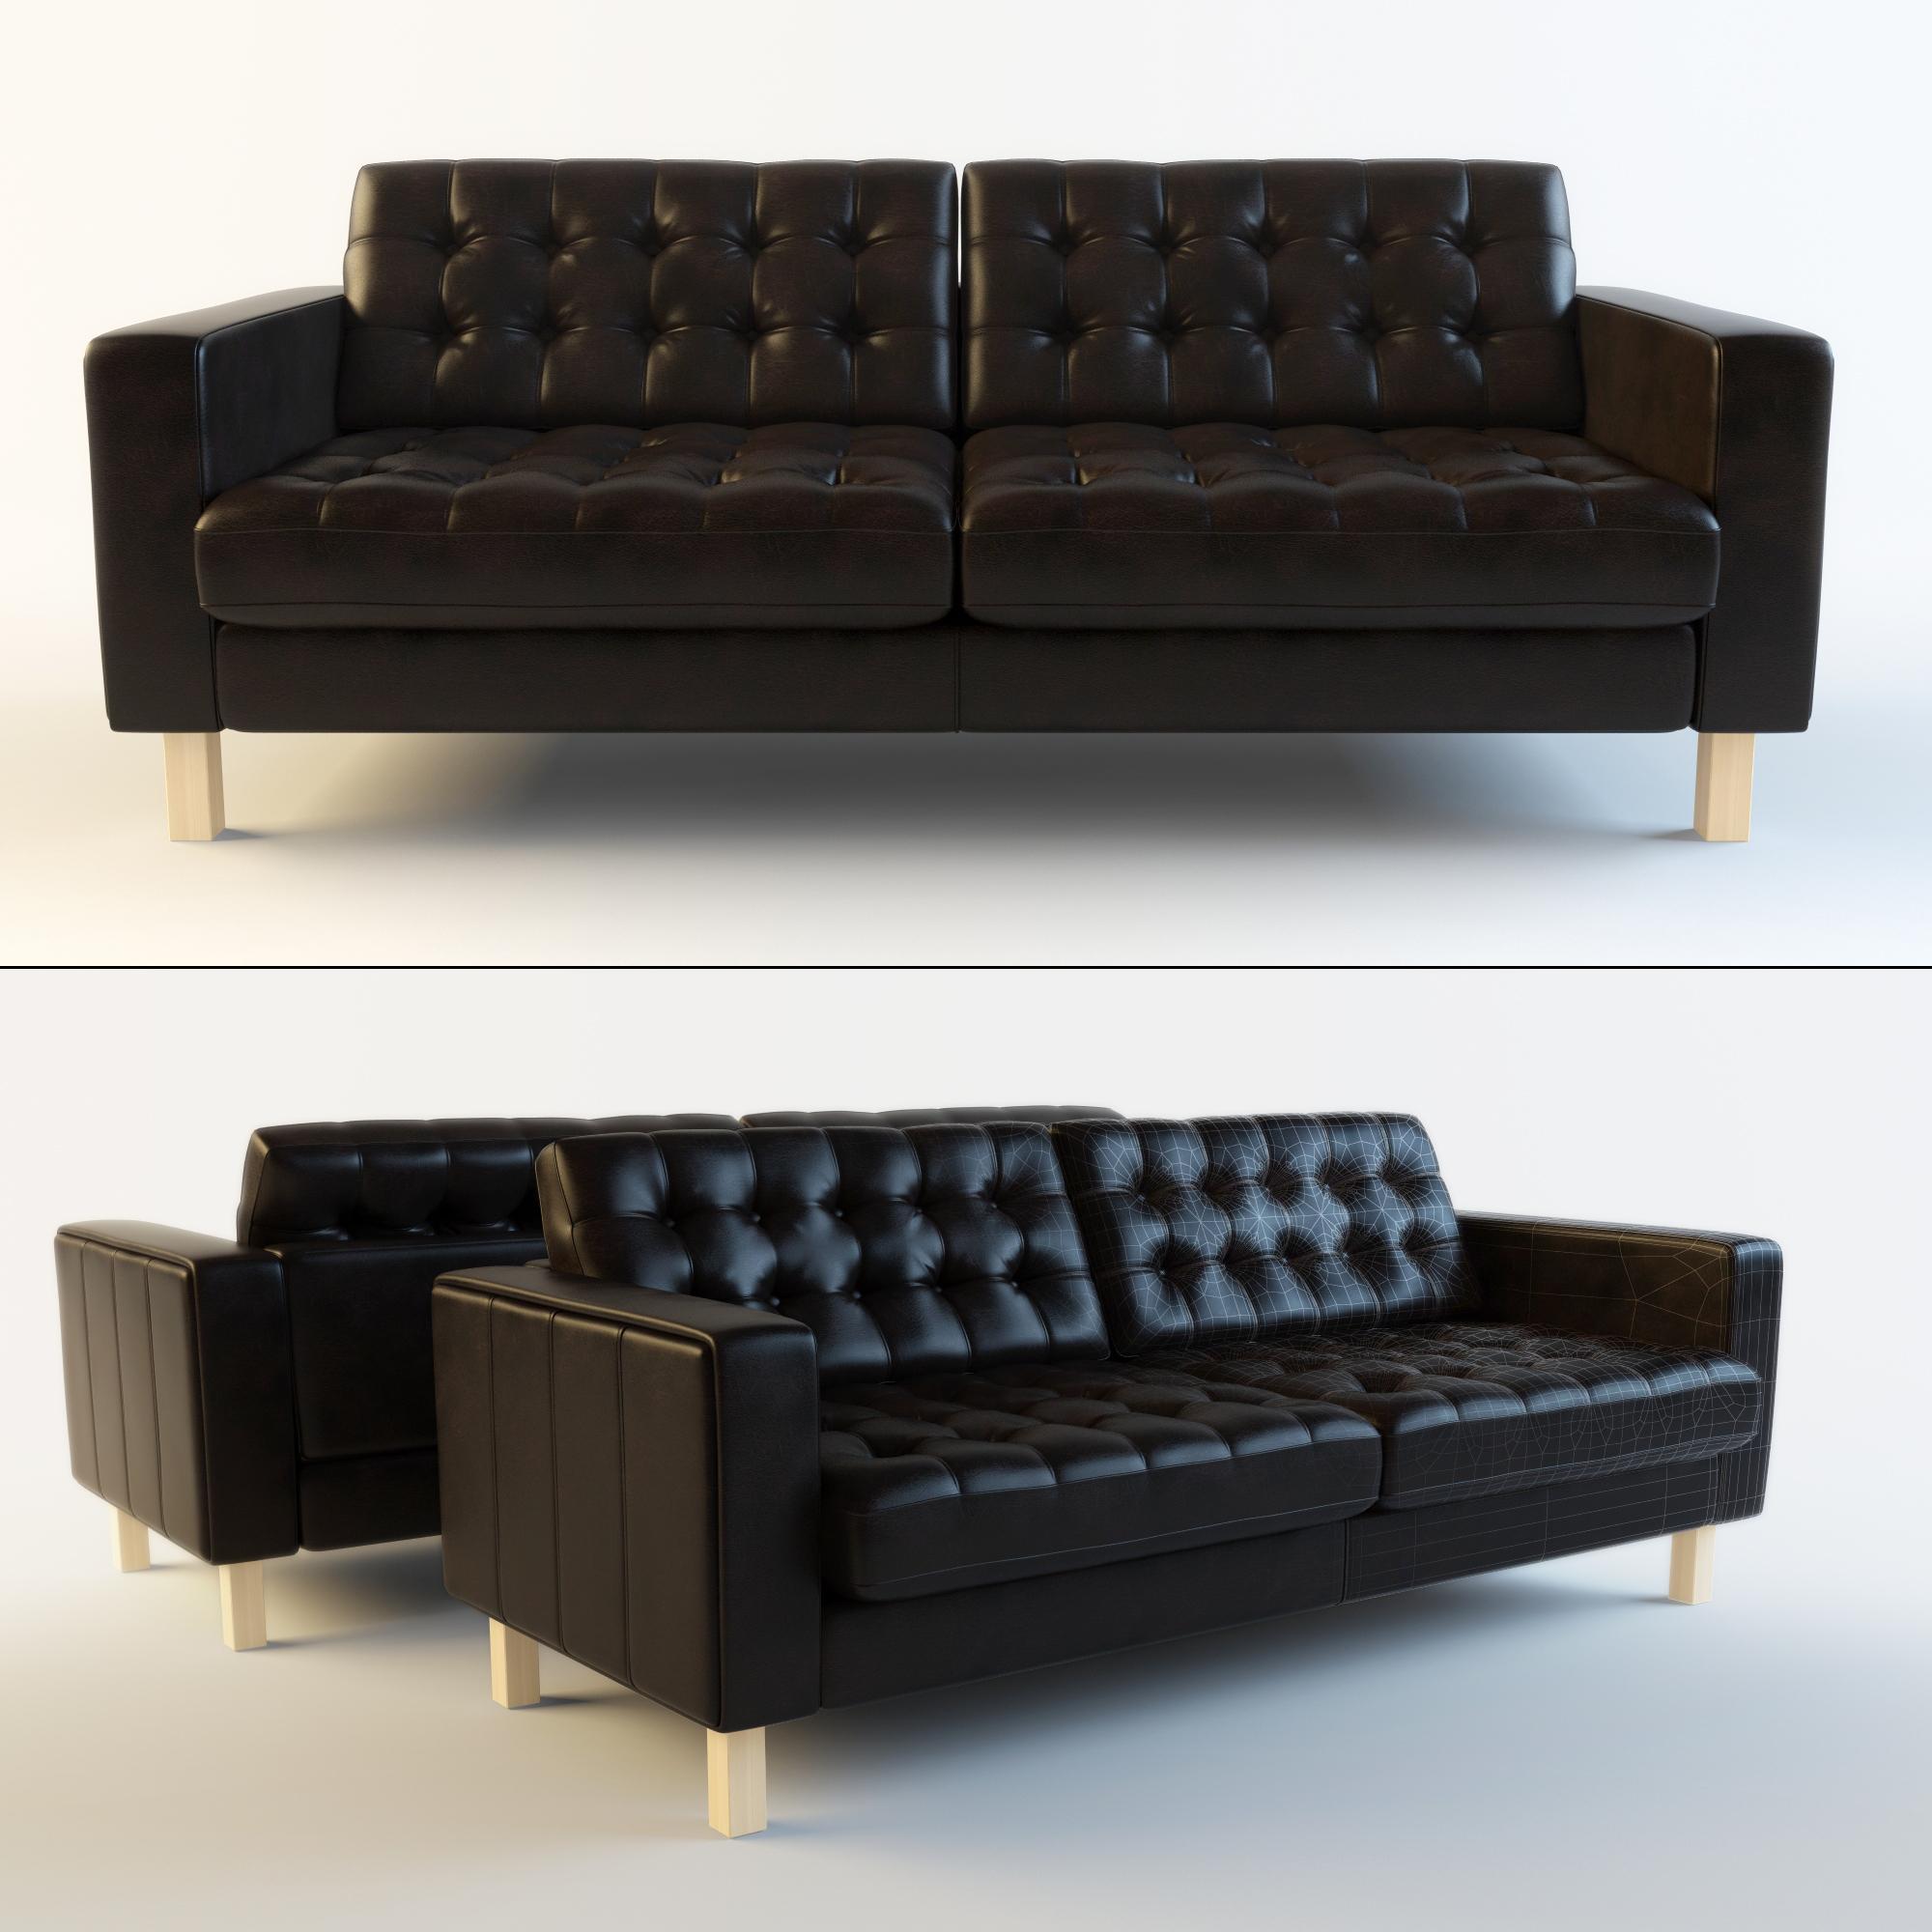 Ikea Karlstad Max